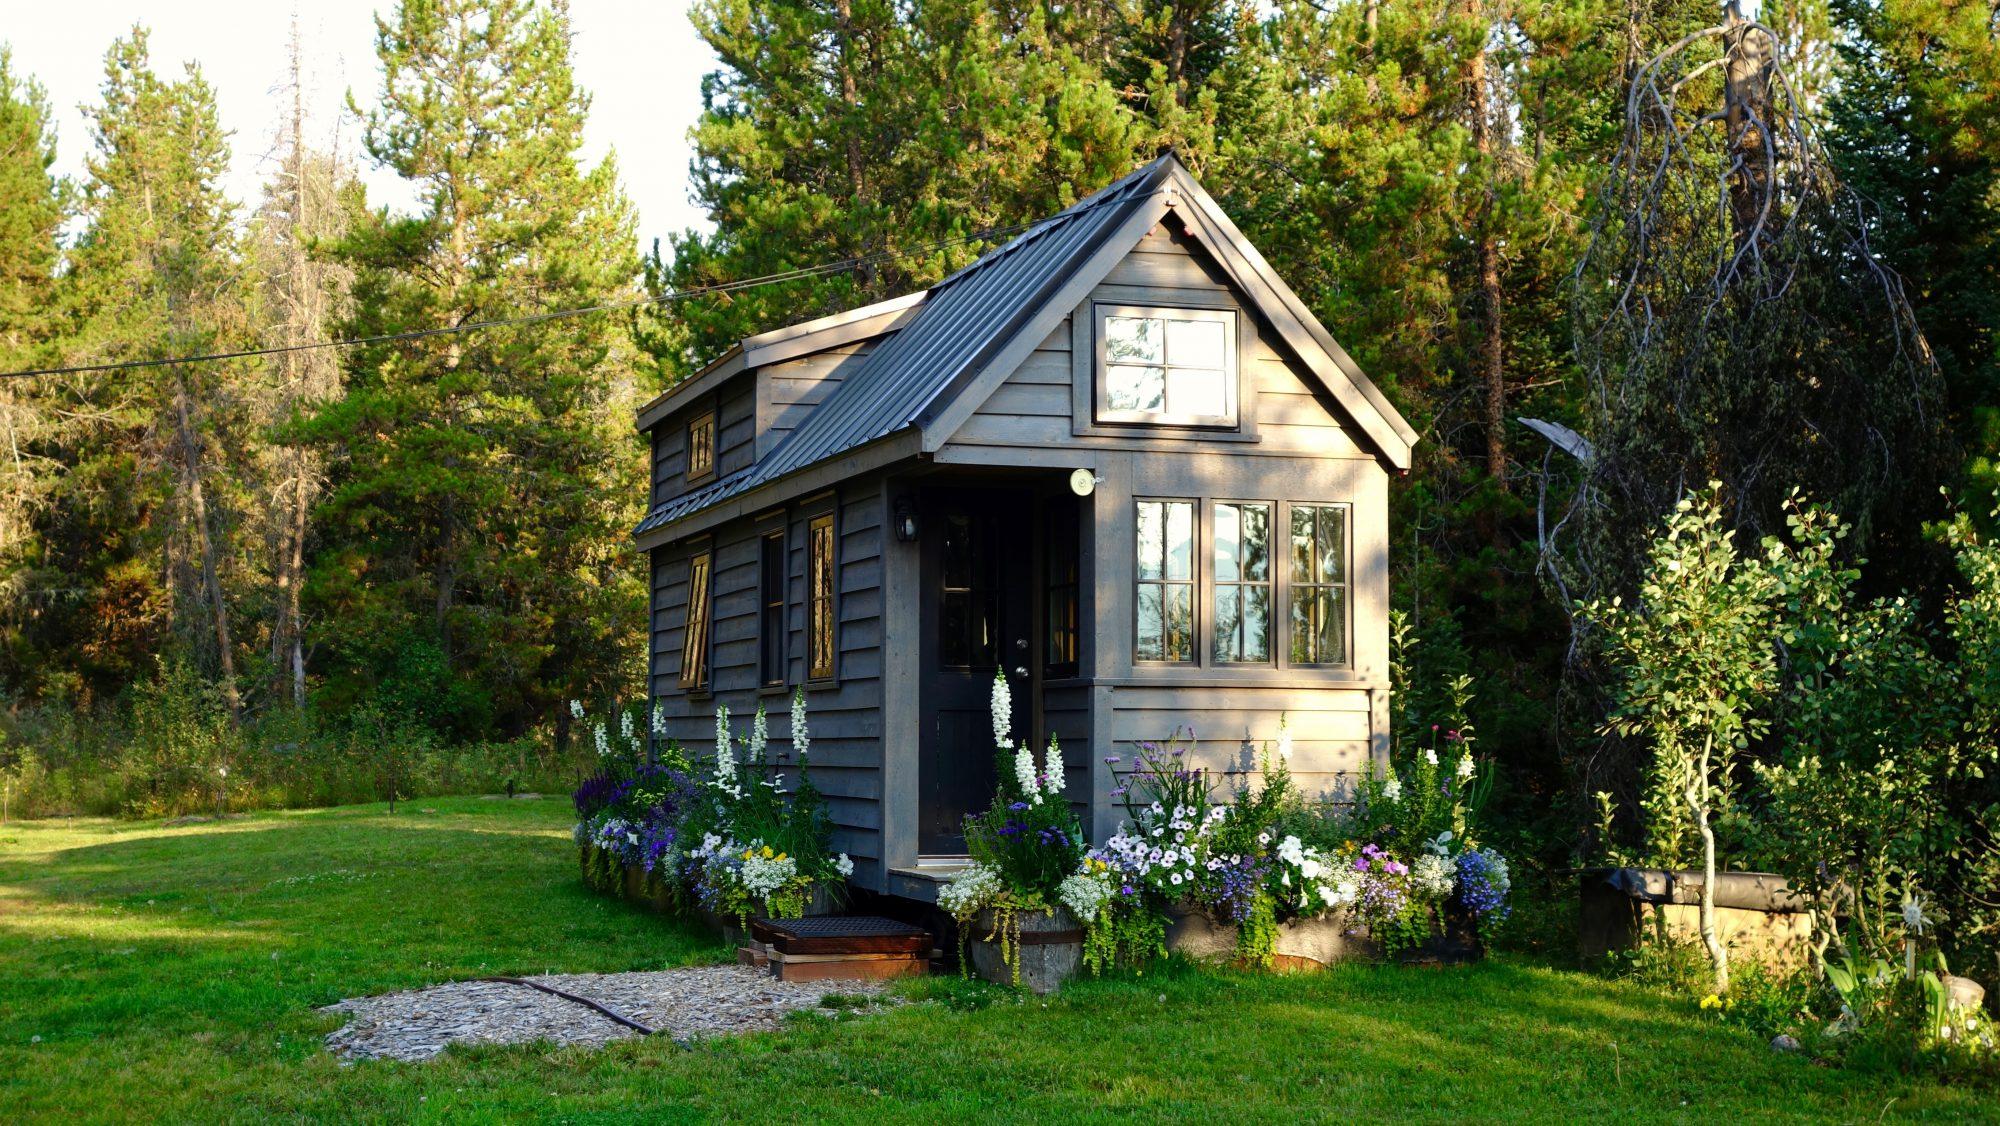 Tiny houses en nieuw bos marjolein in het klein for Tiny house movement nederland